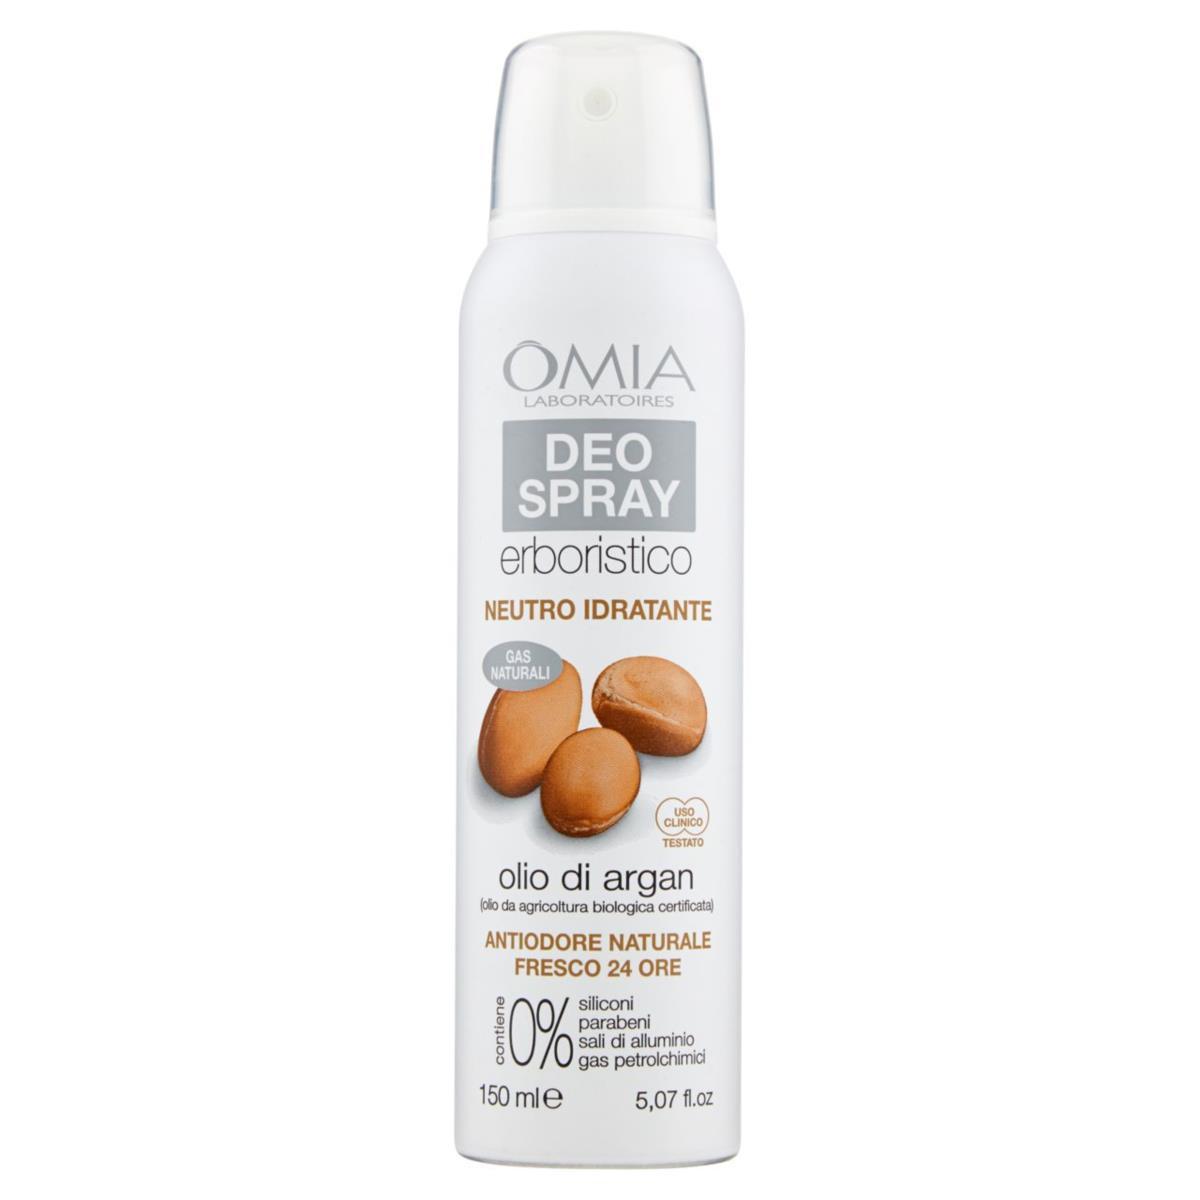 Omia Deodorante Spray Neutro Idratante all'olio d'argan 150 ml